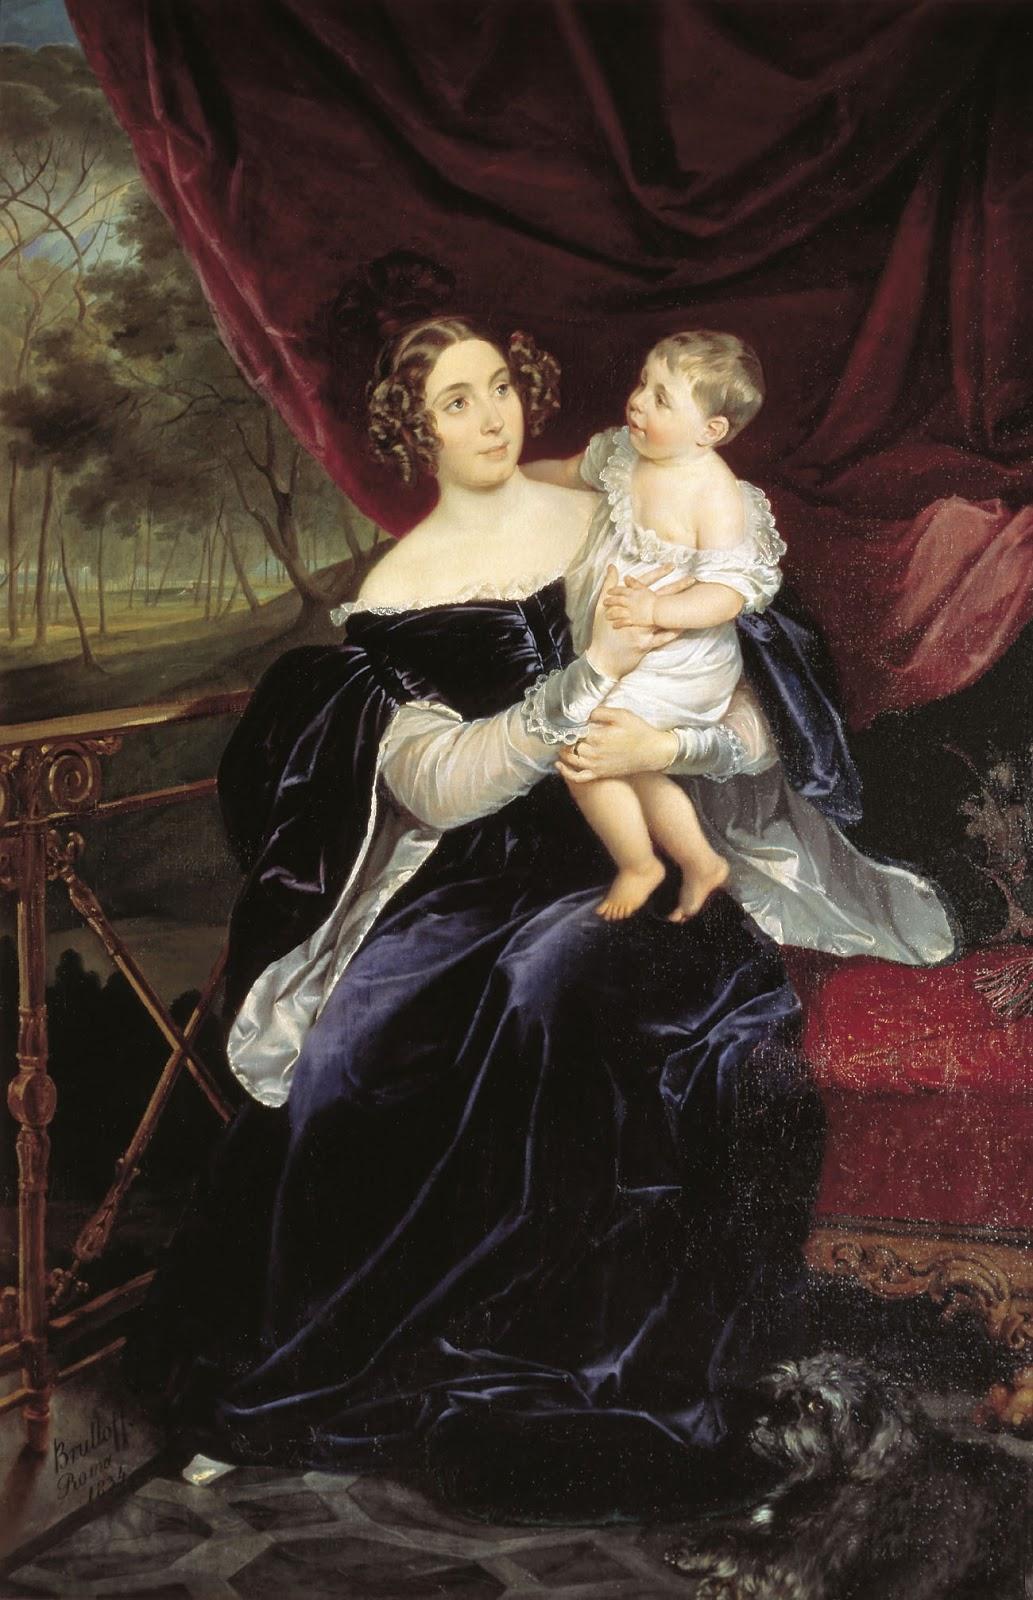 Karl   riullov  Portrait  of  the  Princess  Olga  Ivanovna  Orlova Davydova  with  Daughter  Natalya  Vladimirovna C